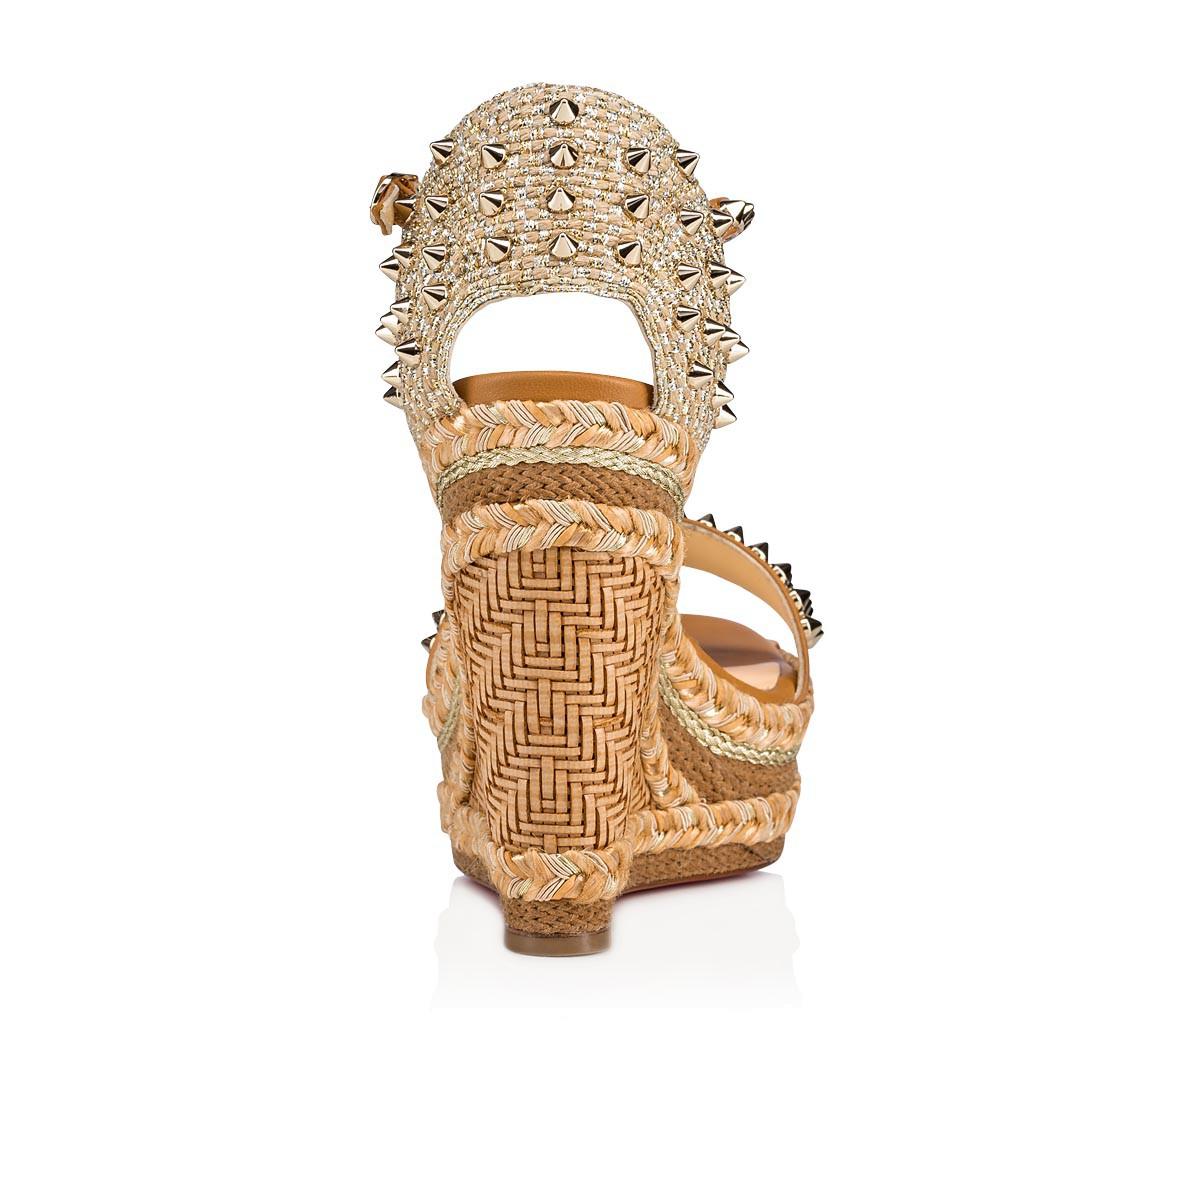 Shoes - Madmonica - Christian Louboutin